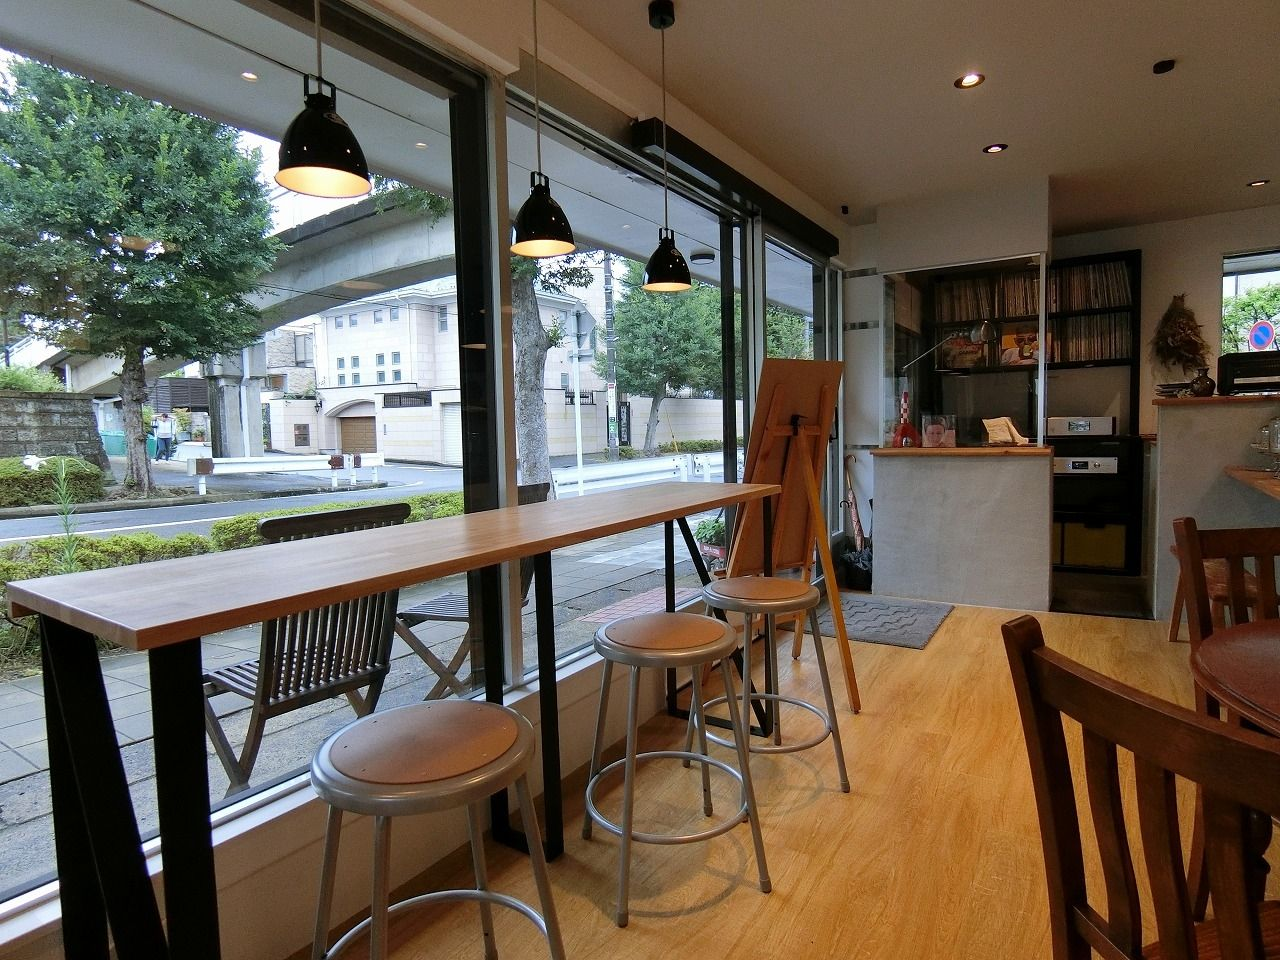 「Madalena Cafe」(マダレーナ カフェ) のカウンター